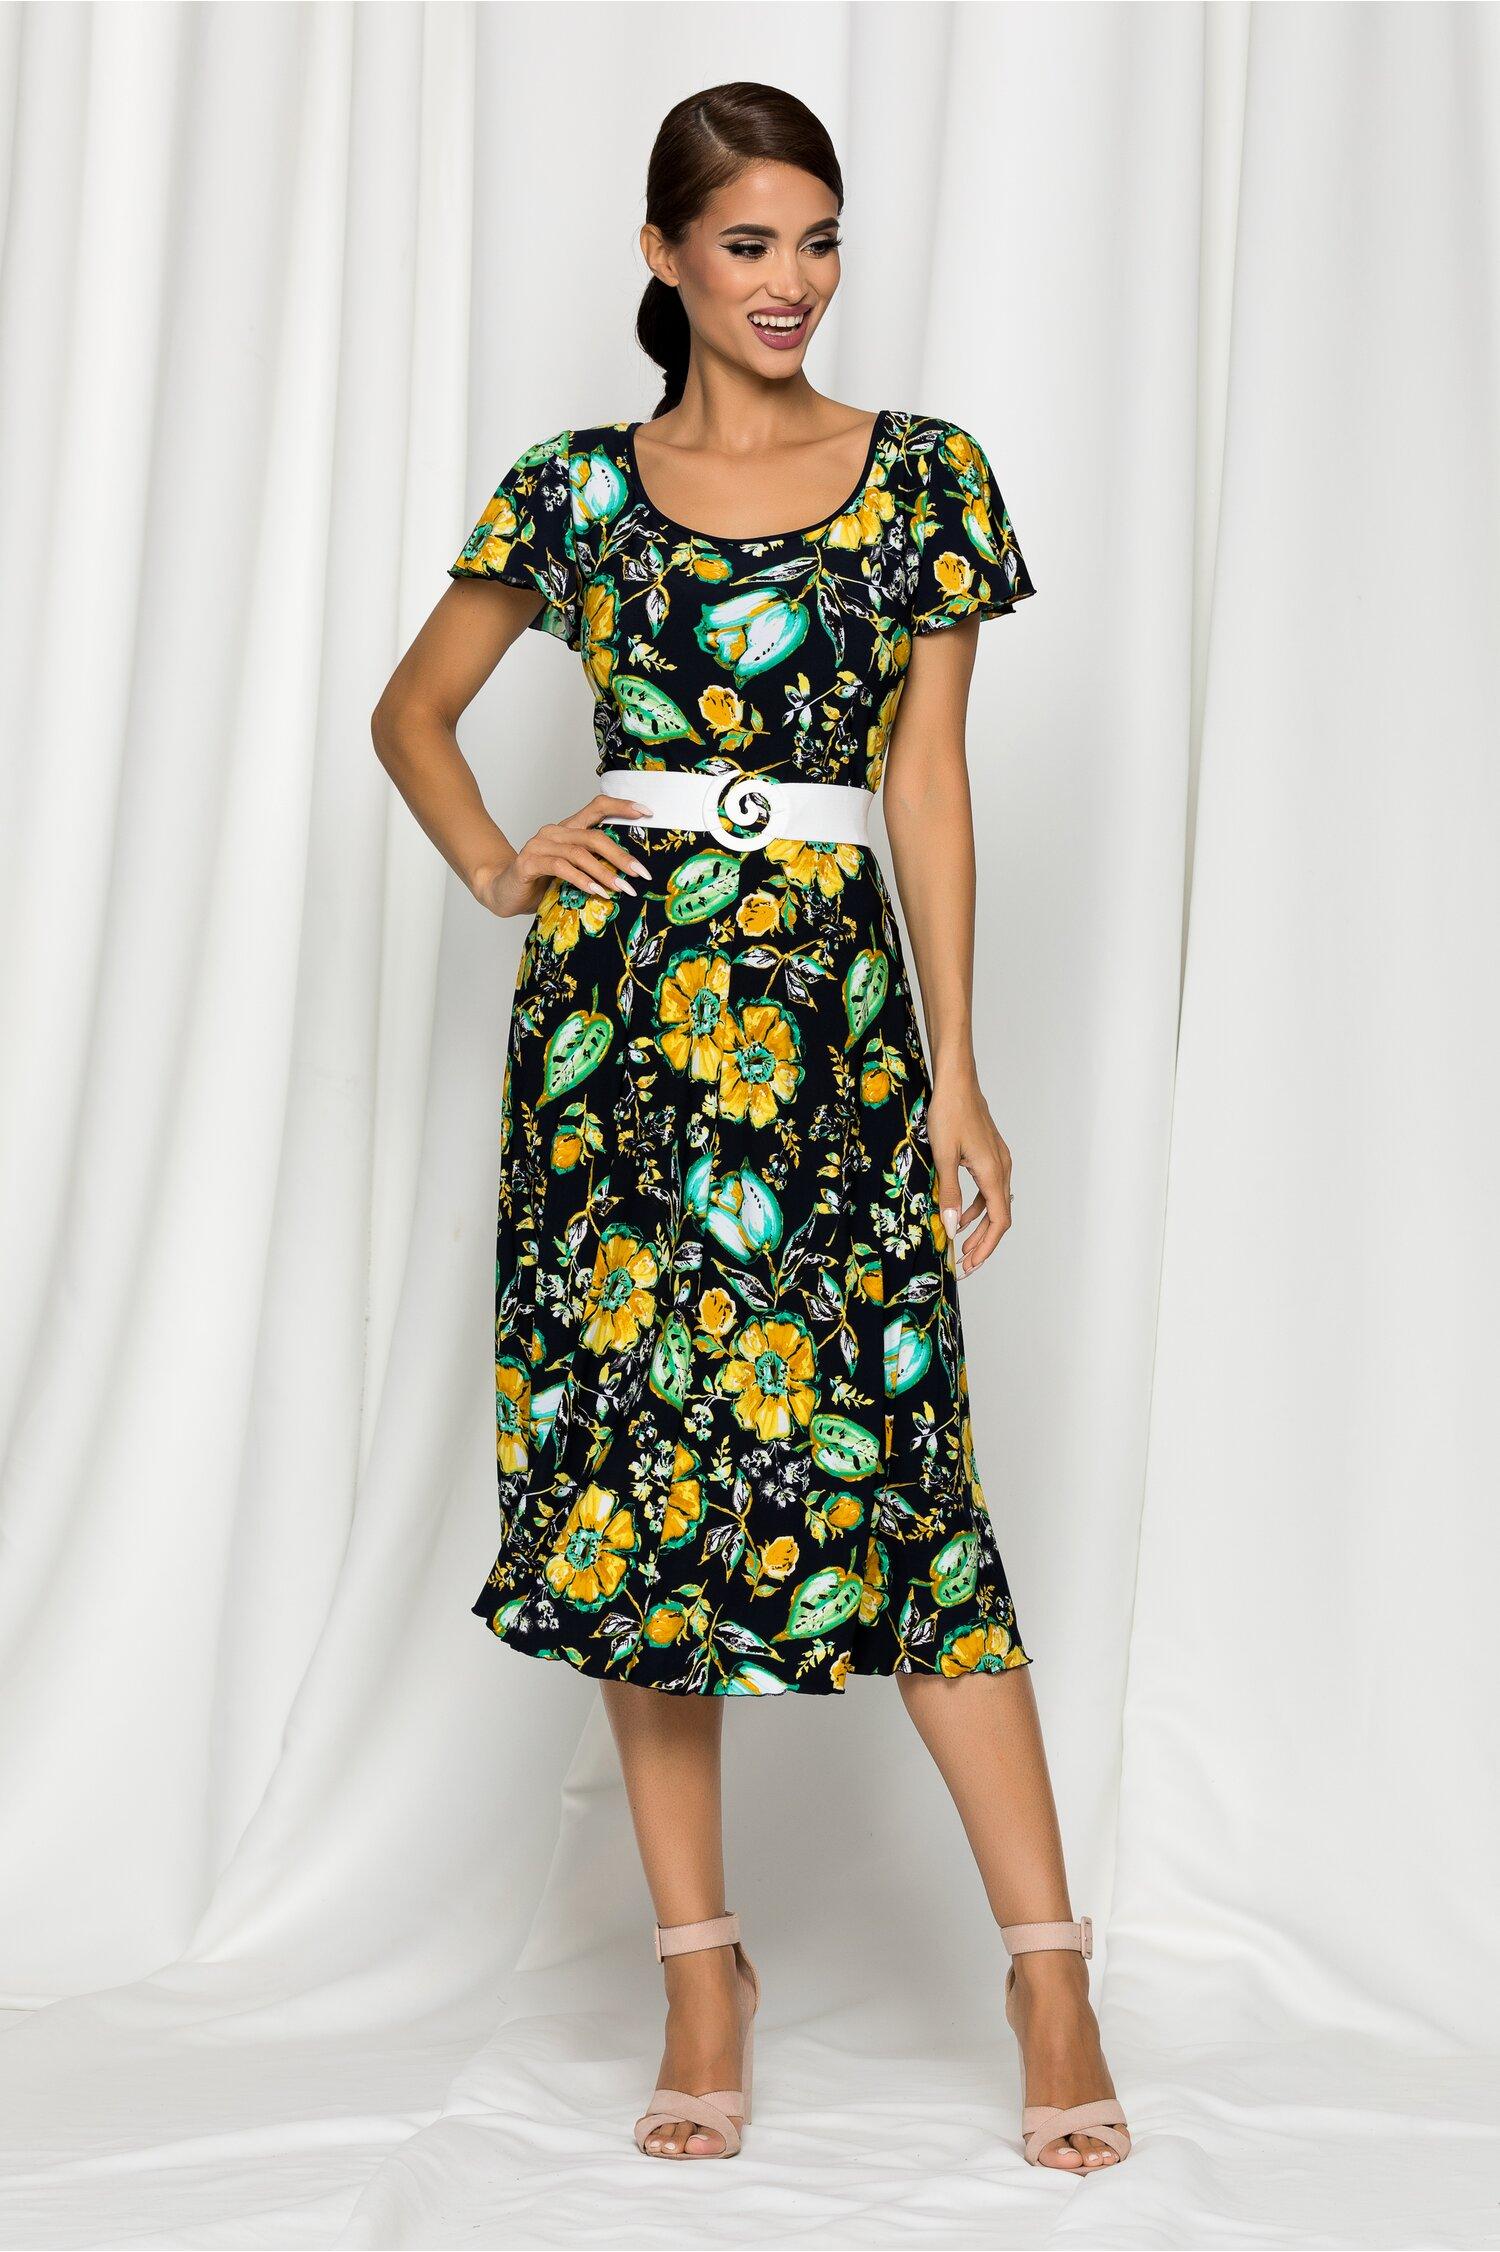 Rochie Karina bleumarin cu imprimeu floral galben